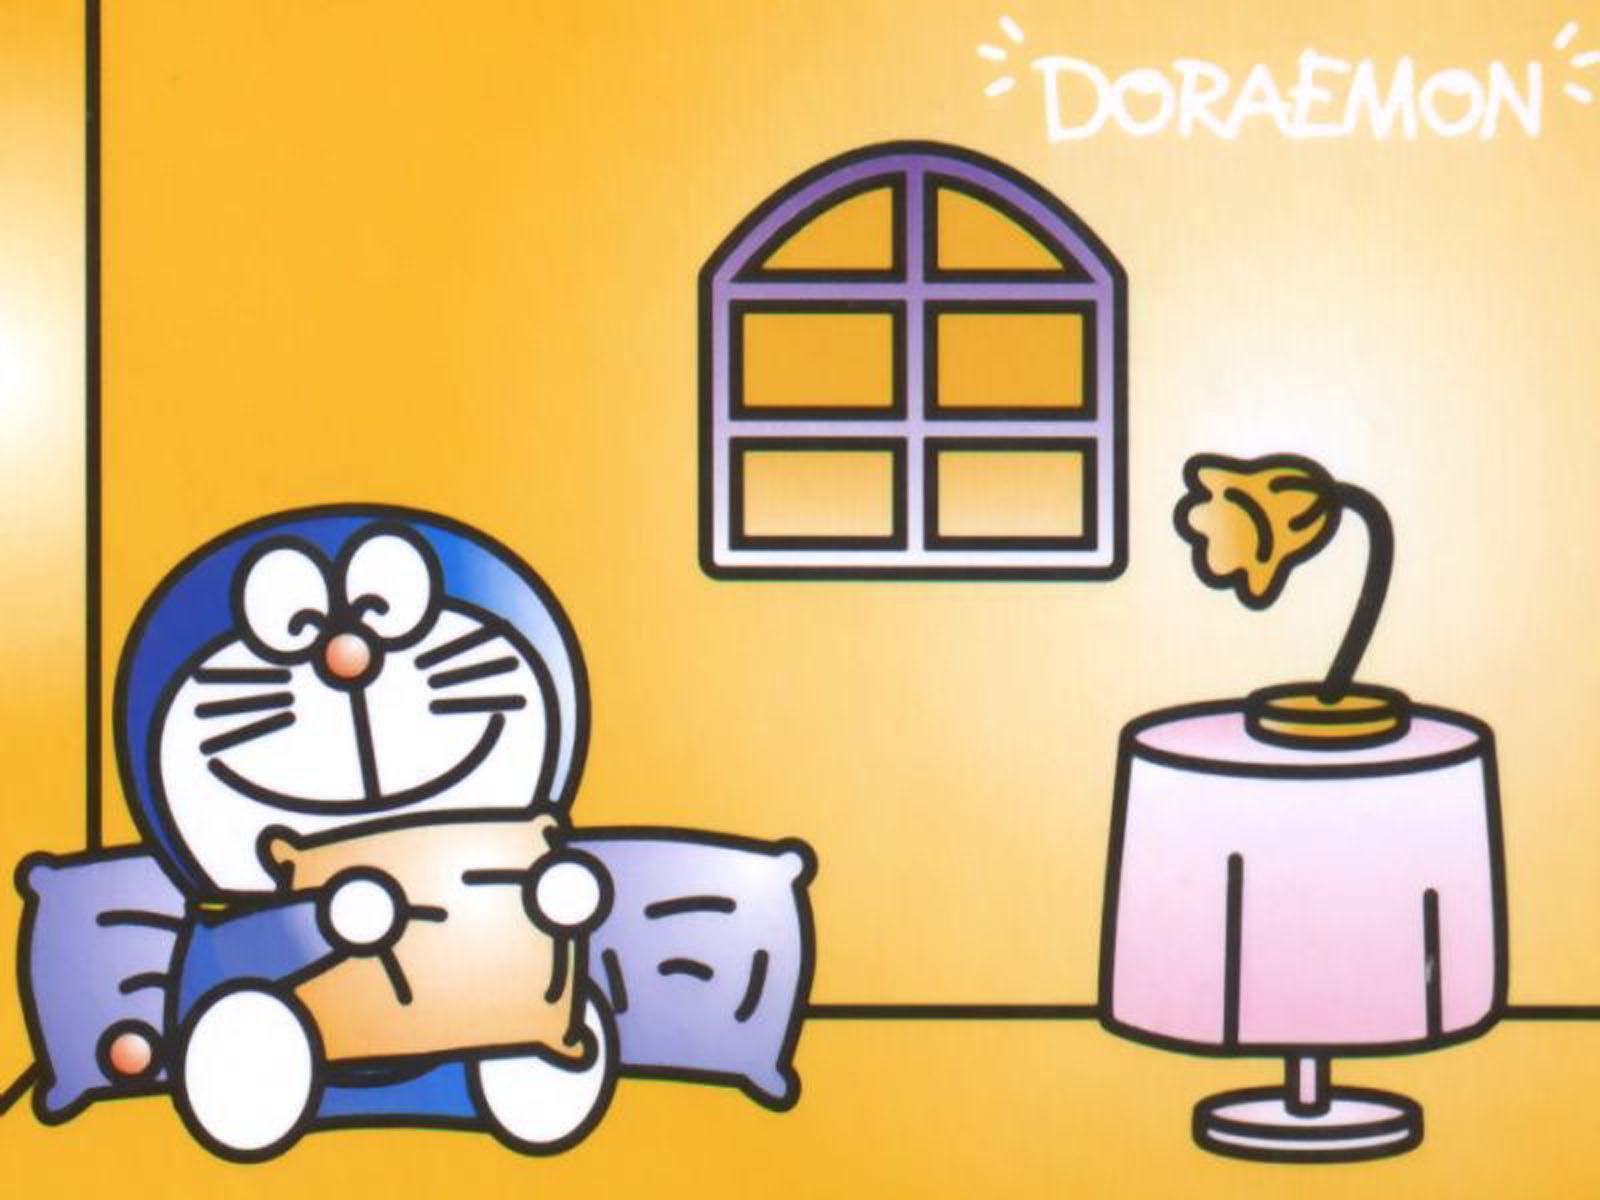 Download wallpaper doraemon free - Wallpapers